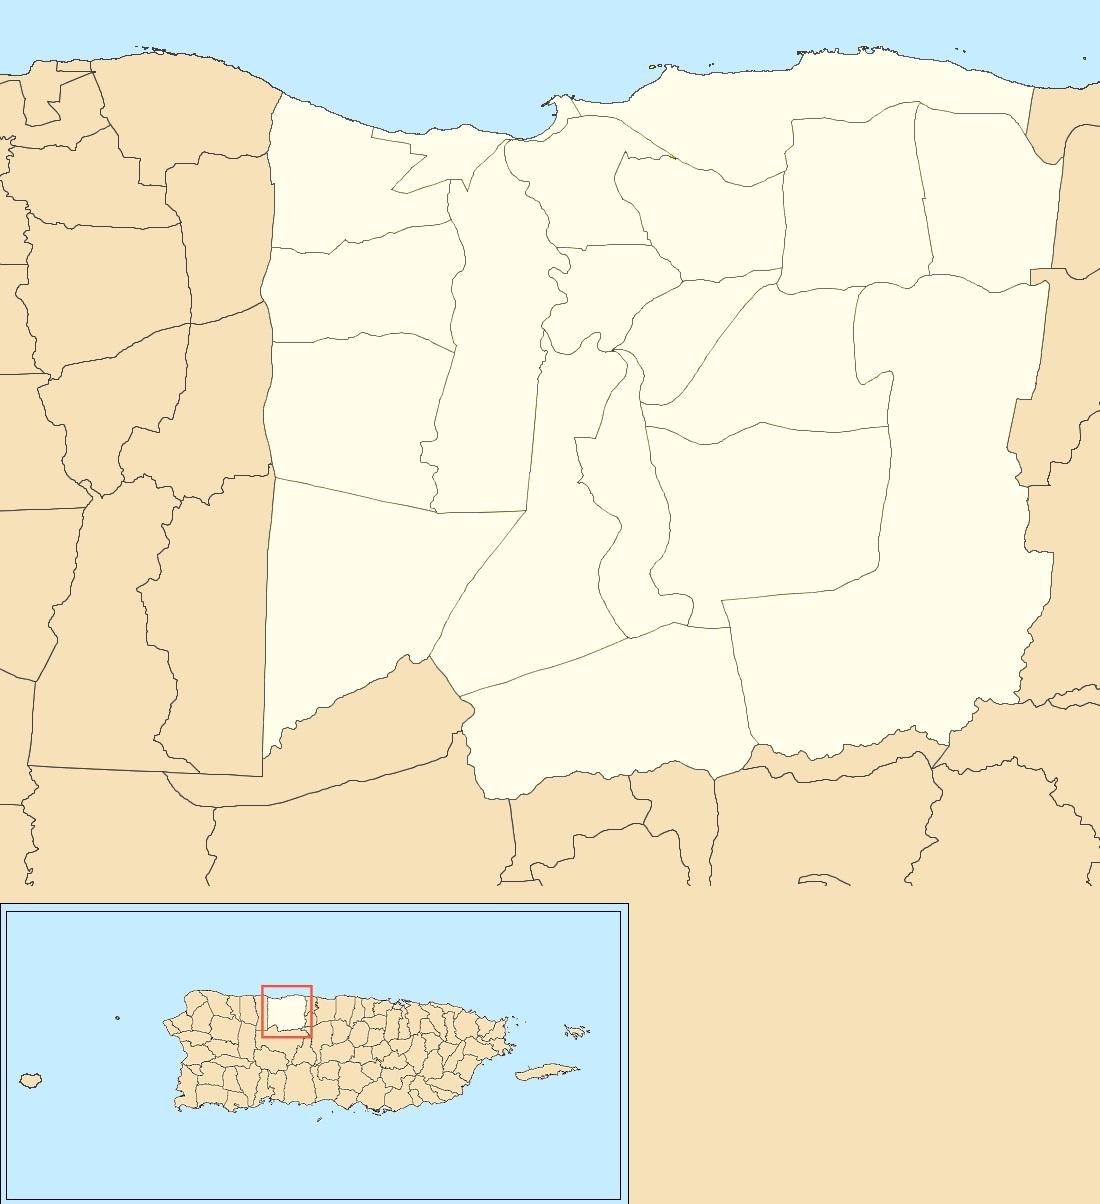 map of arecibo puerto rico File Barrios Of Arecibo Puerto Rico Locator Map Jpg Wikimedia map of arecibo puerto rico